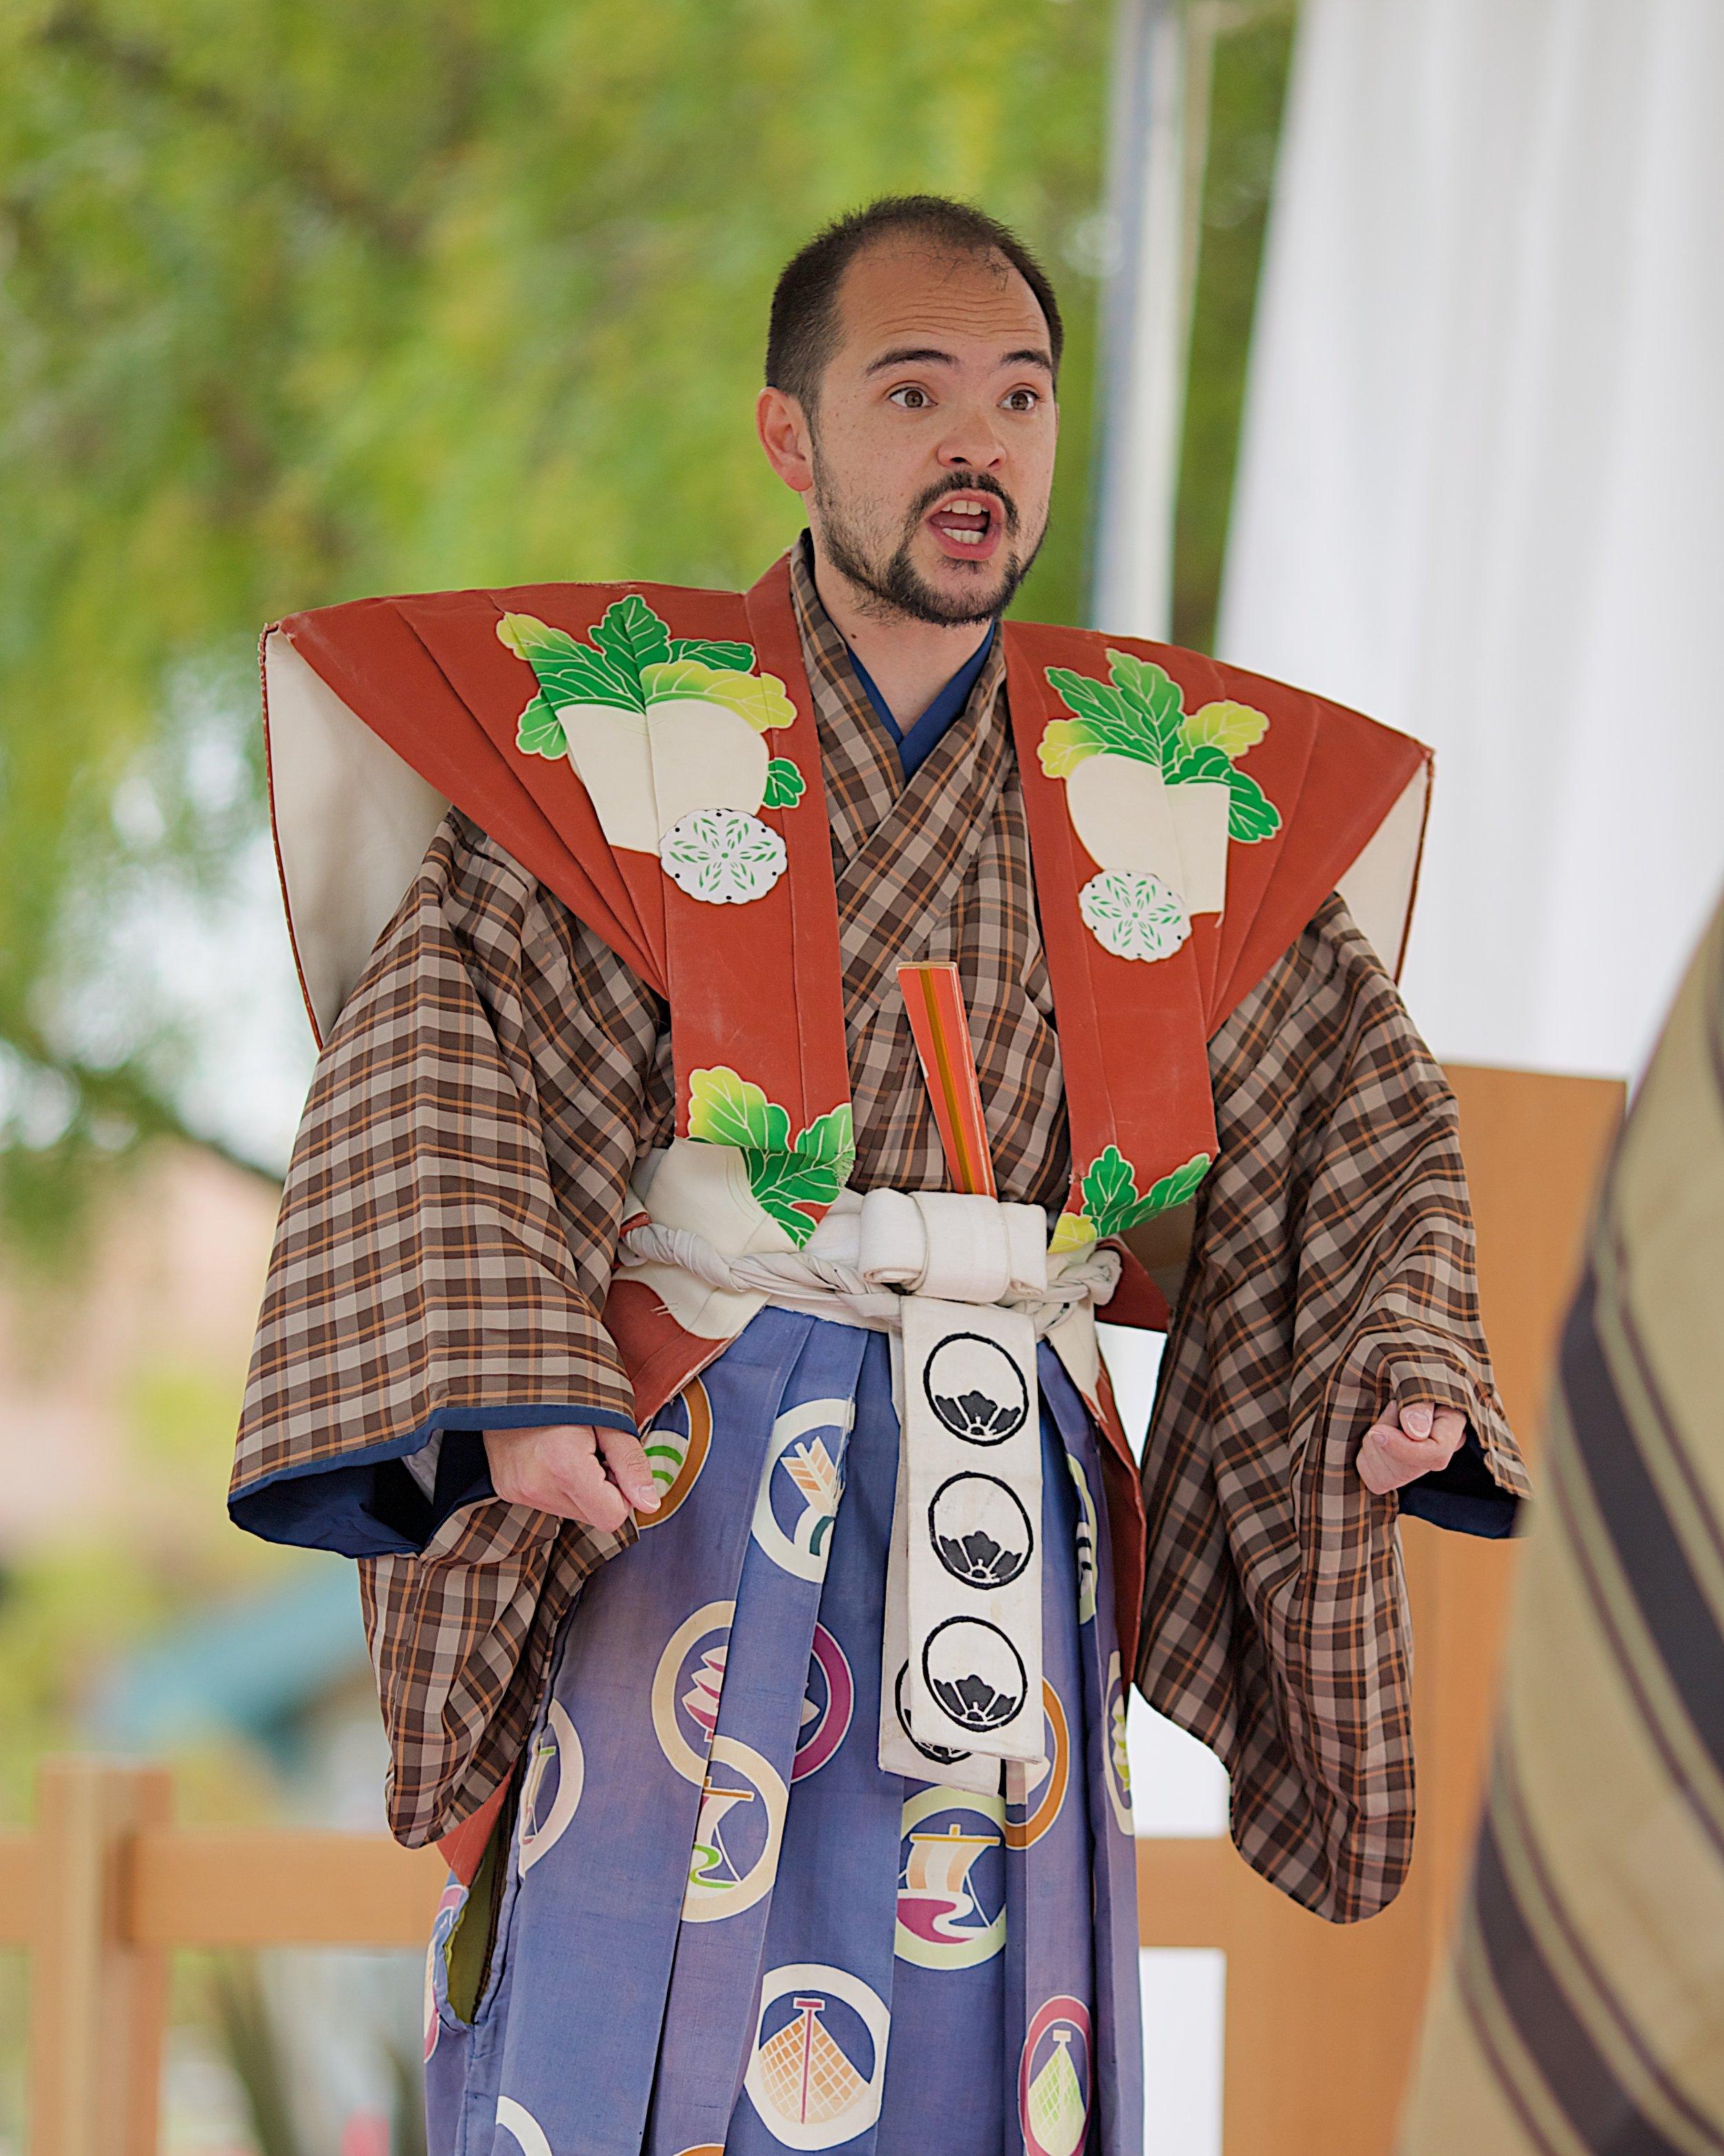 japanese-cultural-fair-of-santa-cruz-2015_18975750623_o.jpg